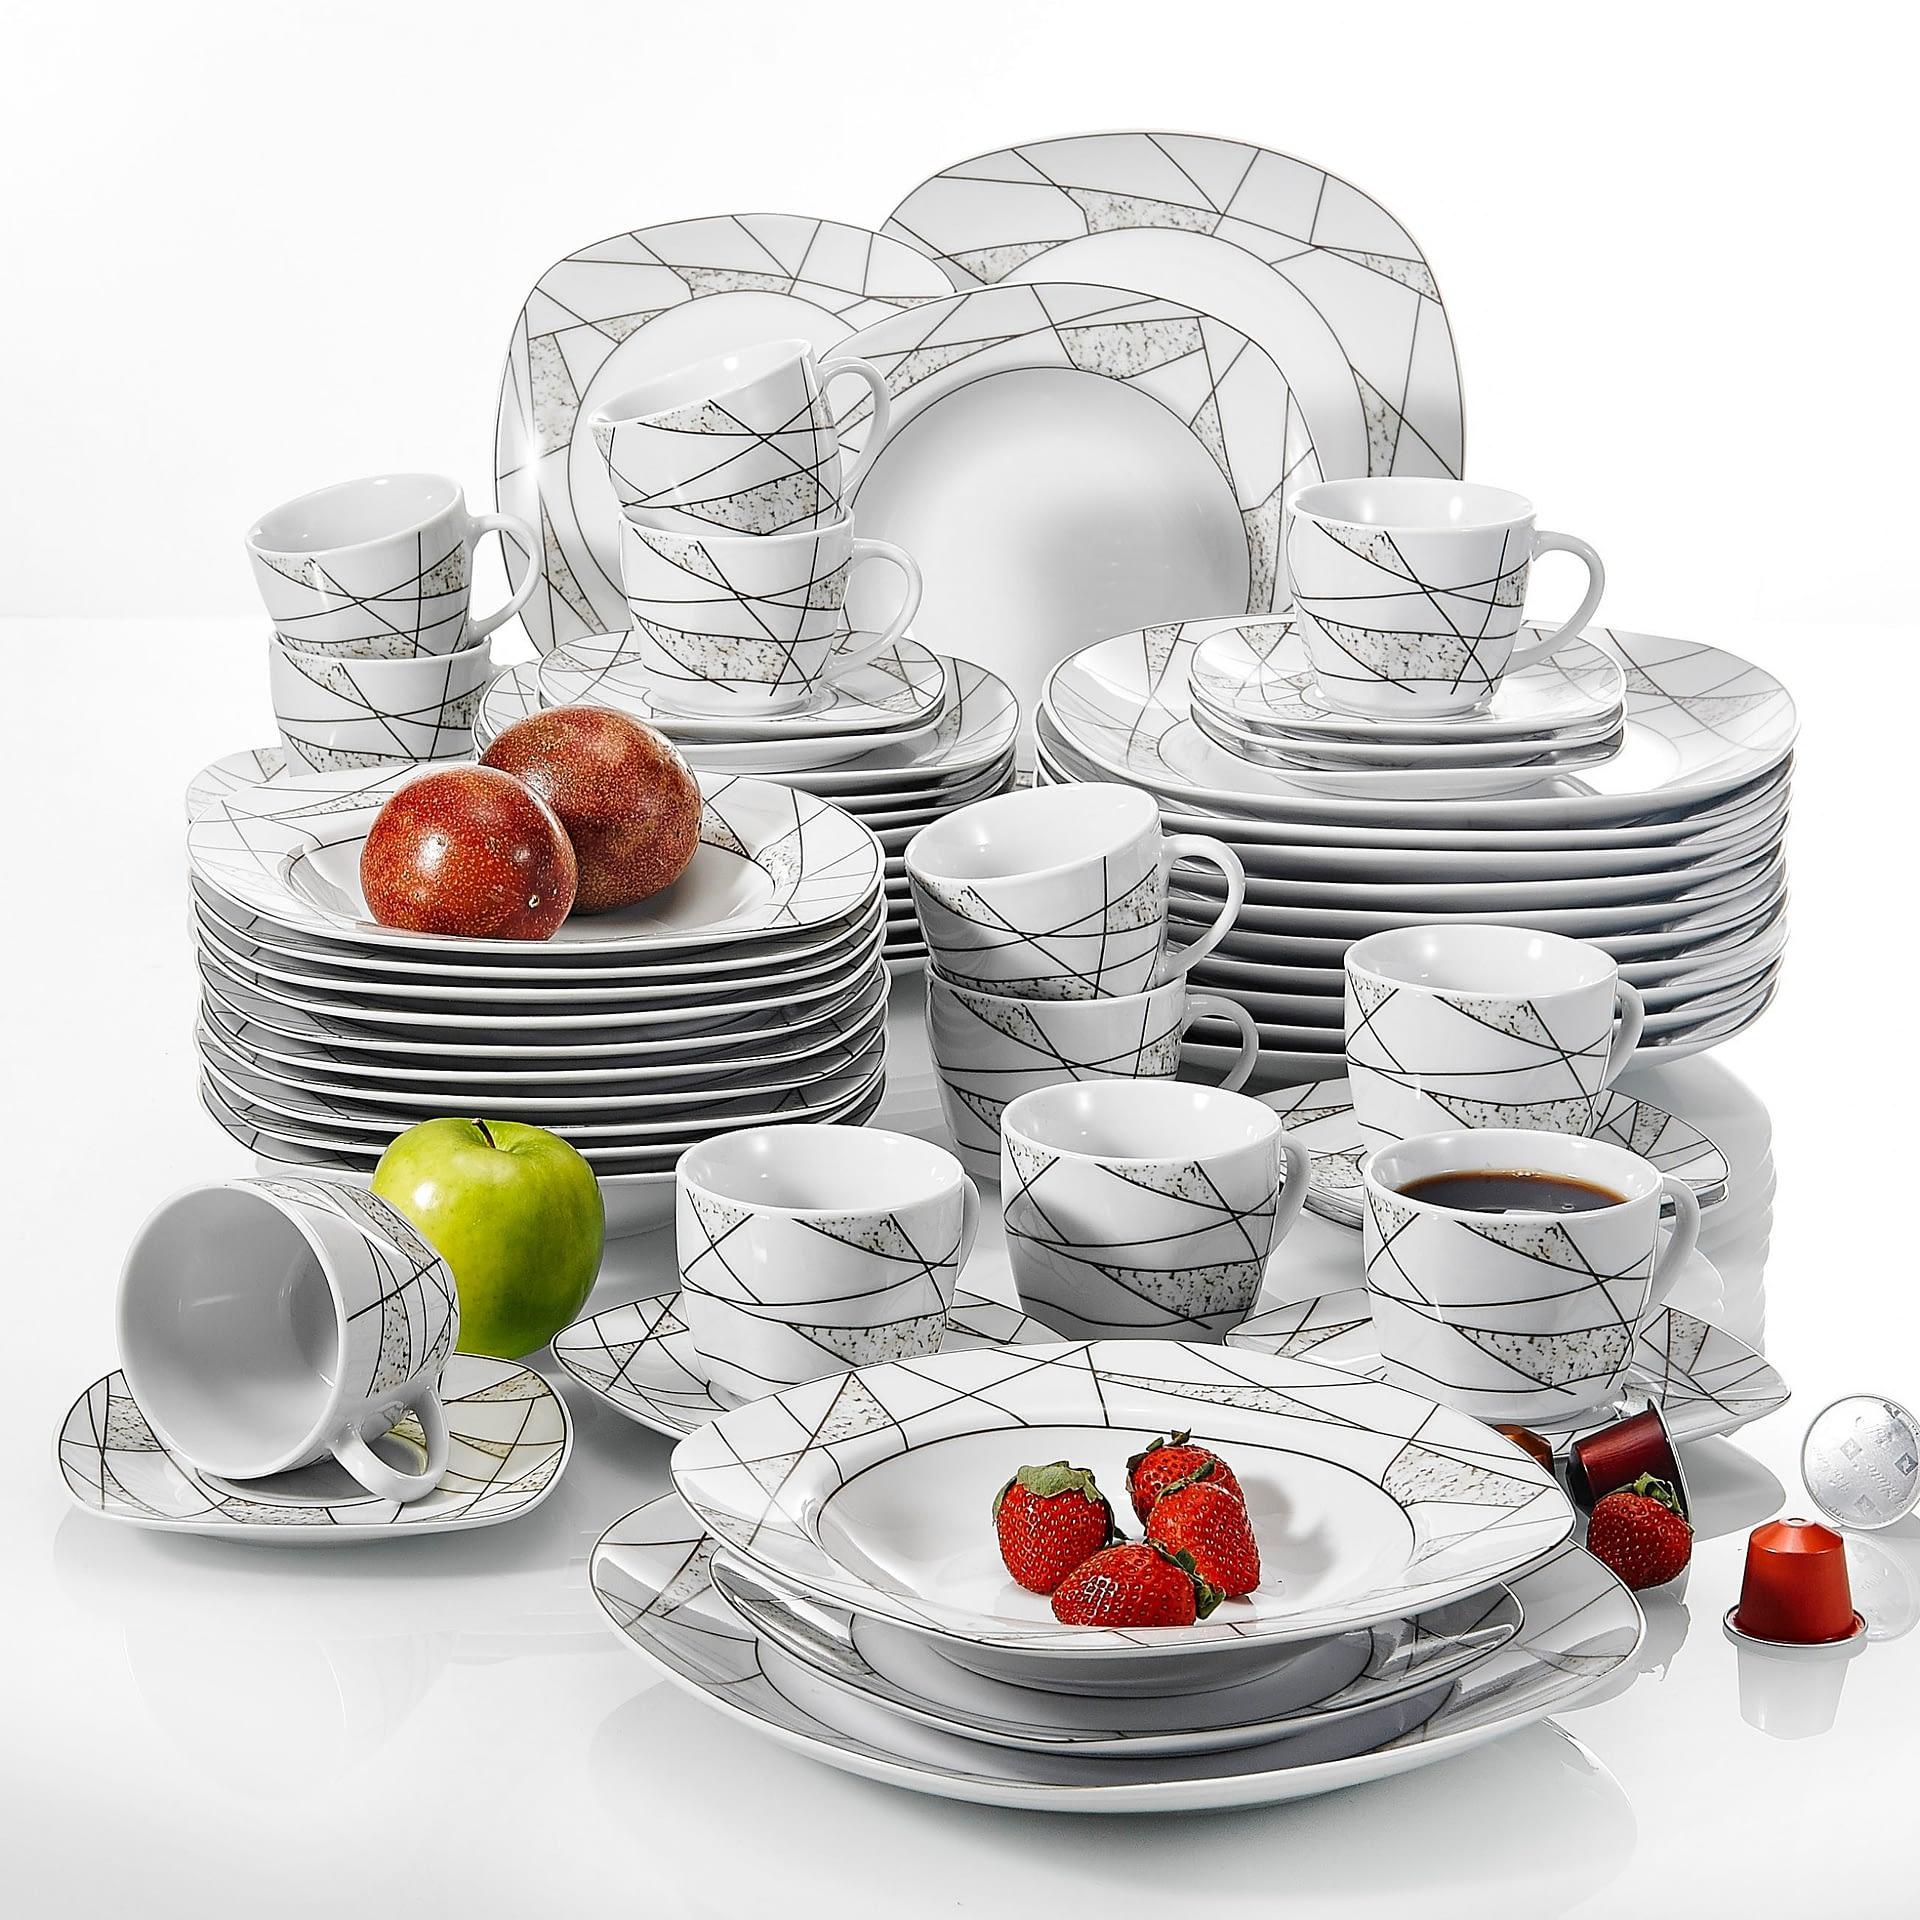 60 Piece Porcelain Ceramic Dinner Set